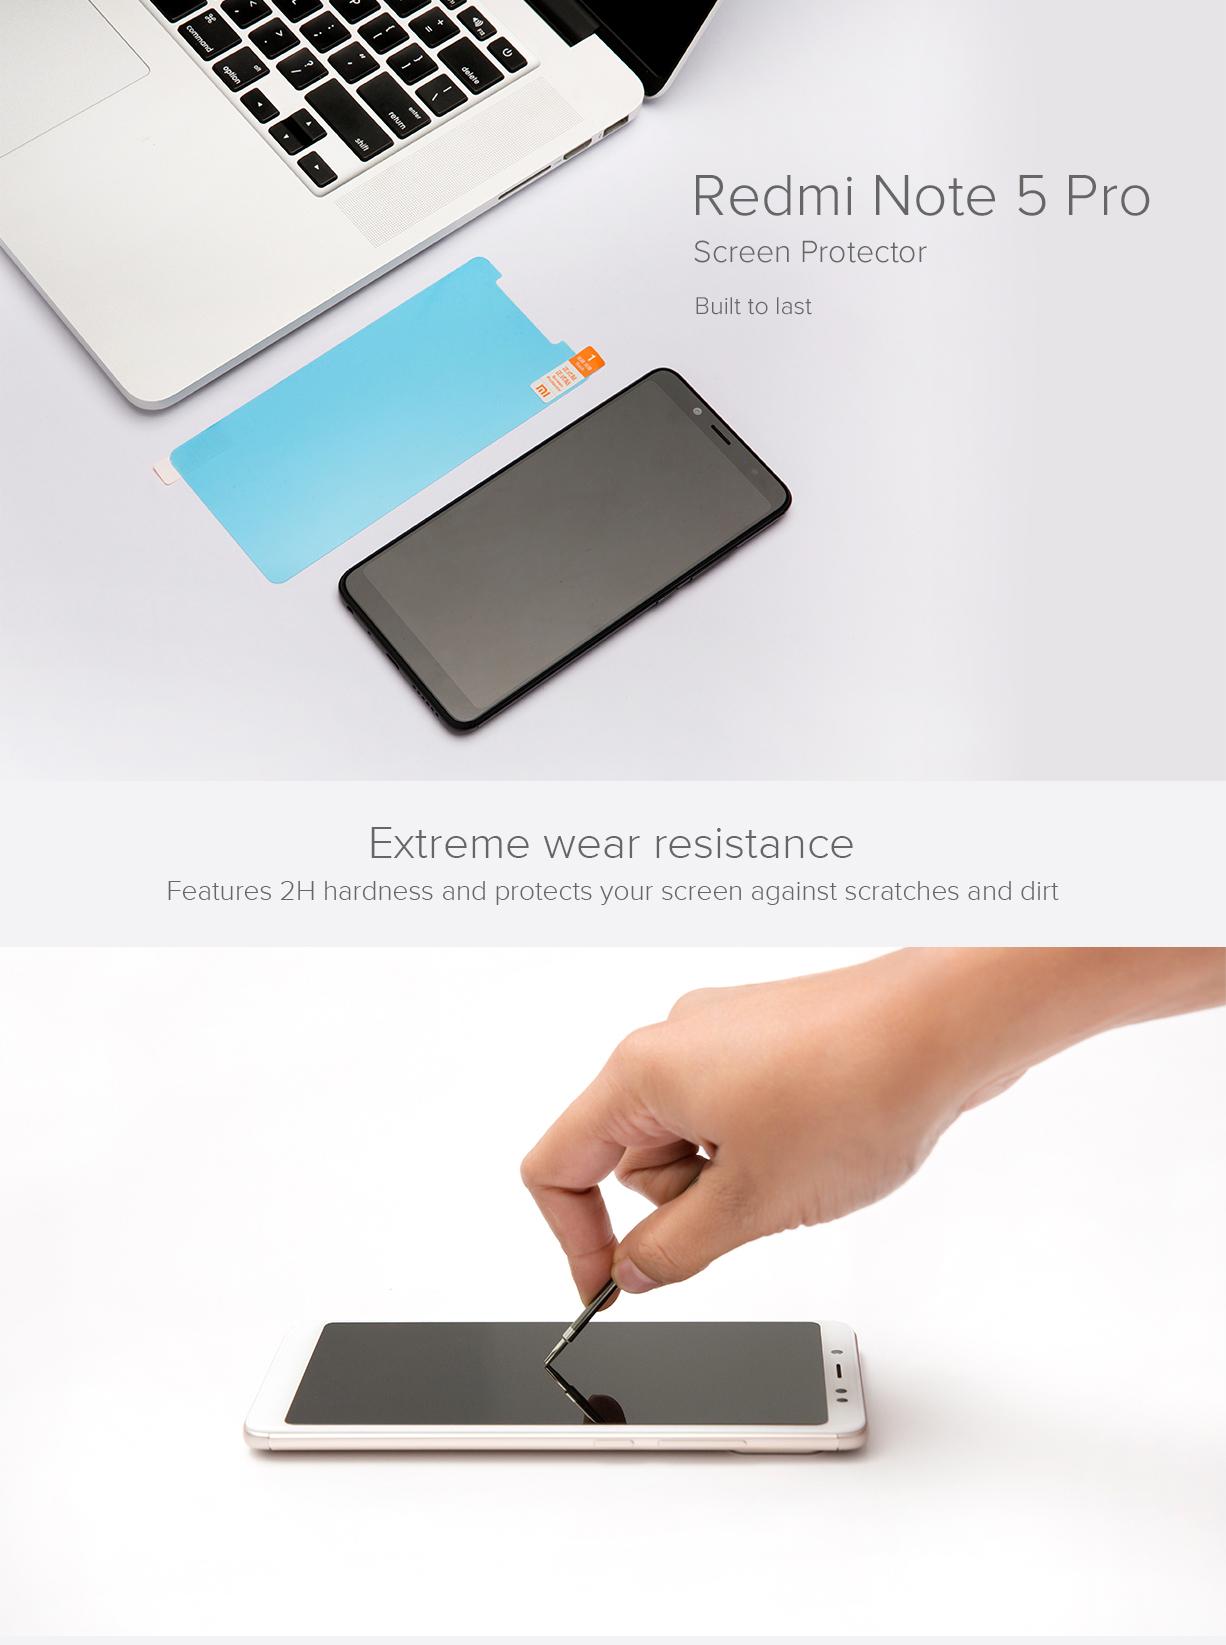 Redmi Note 5 Pro Screen Protector - Cases & Protectors